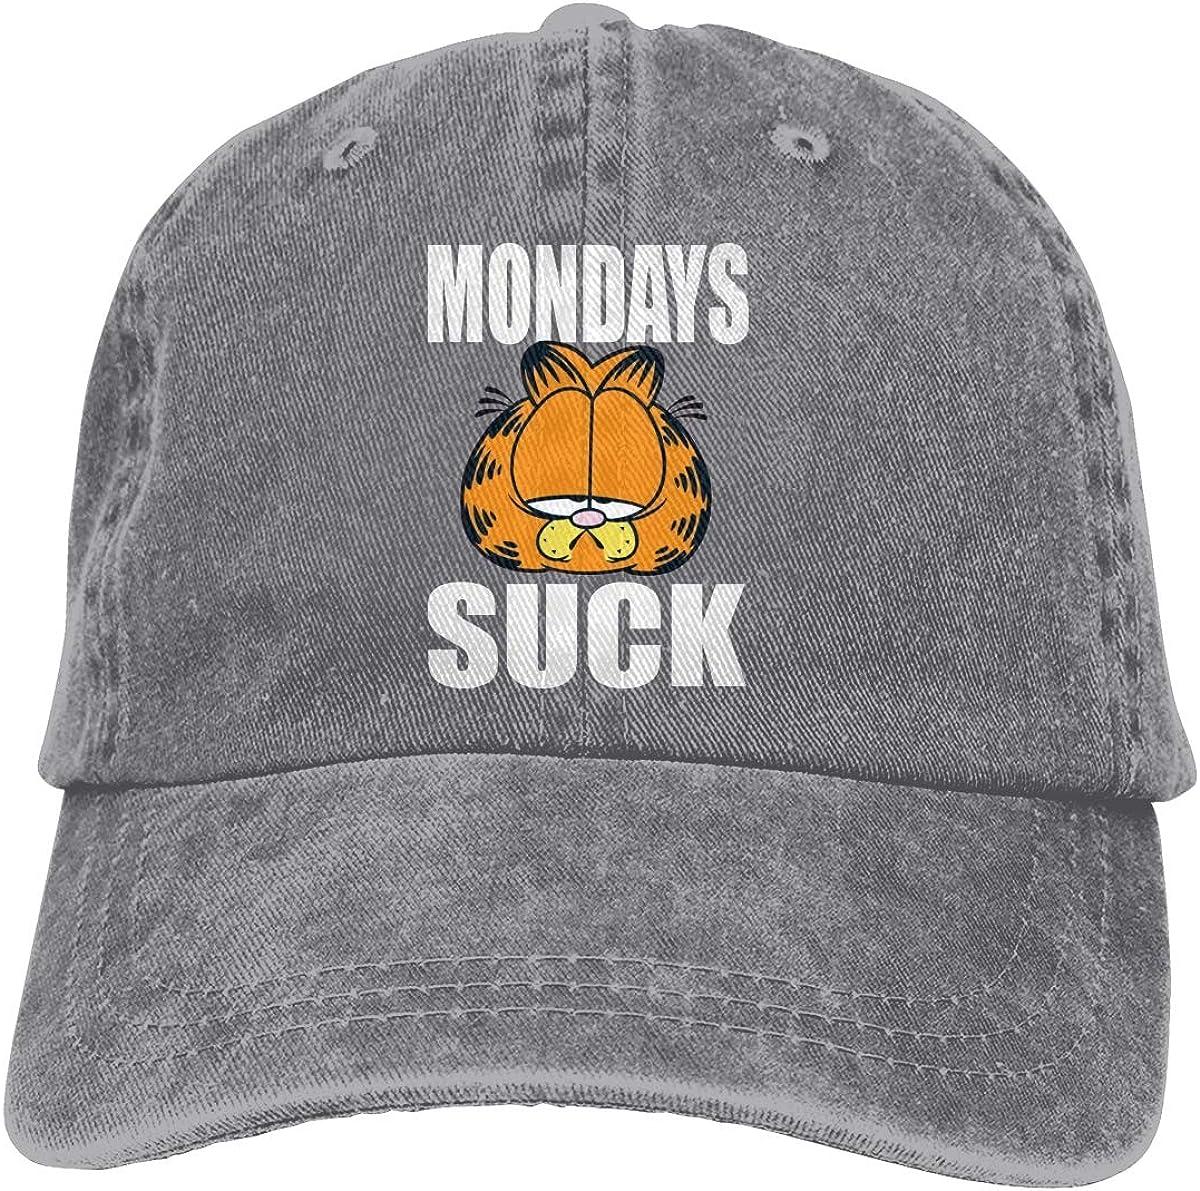 N//C Rug-Rats Unisex Soft Hat Retro Adjustable Baseball Cap Cowboy Hat